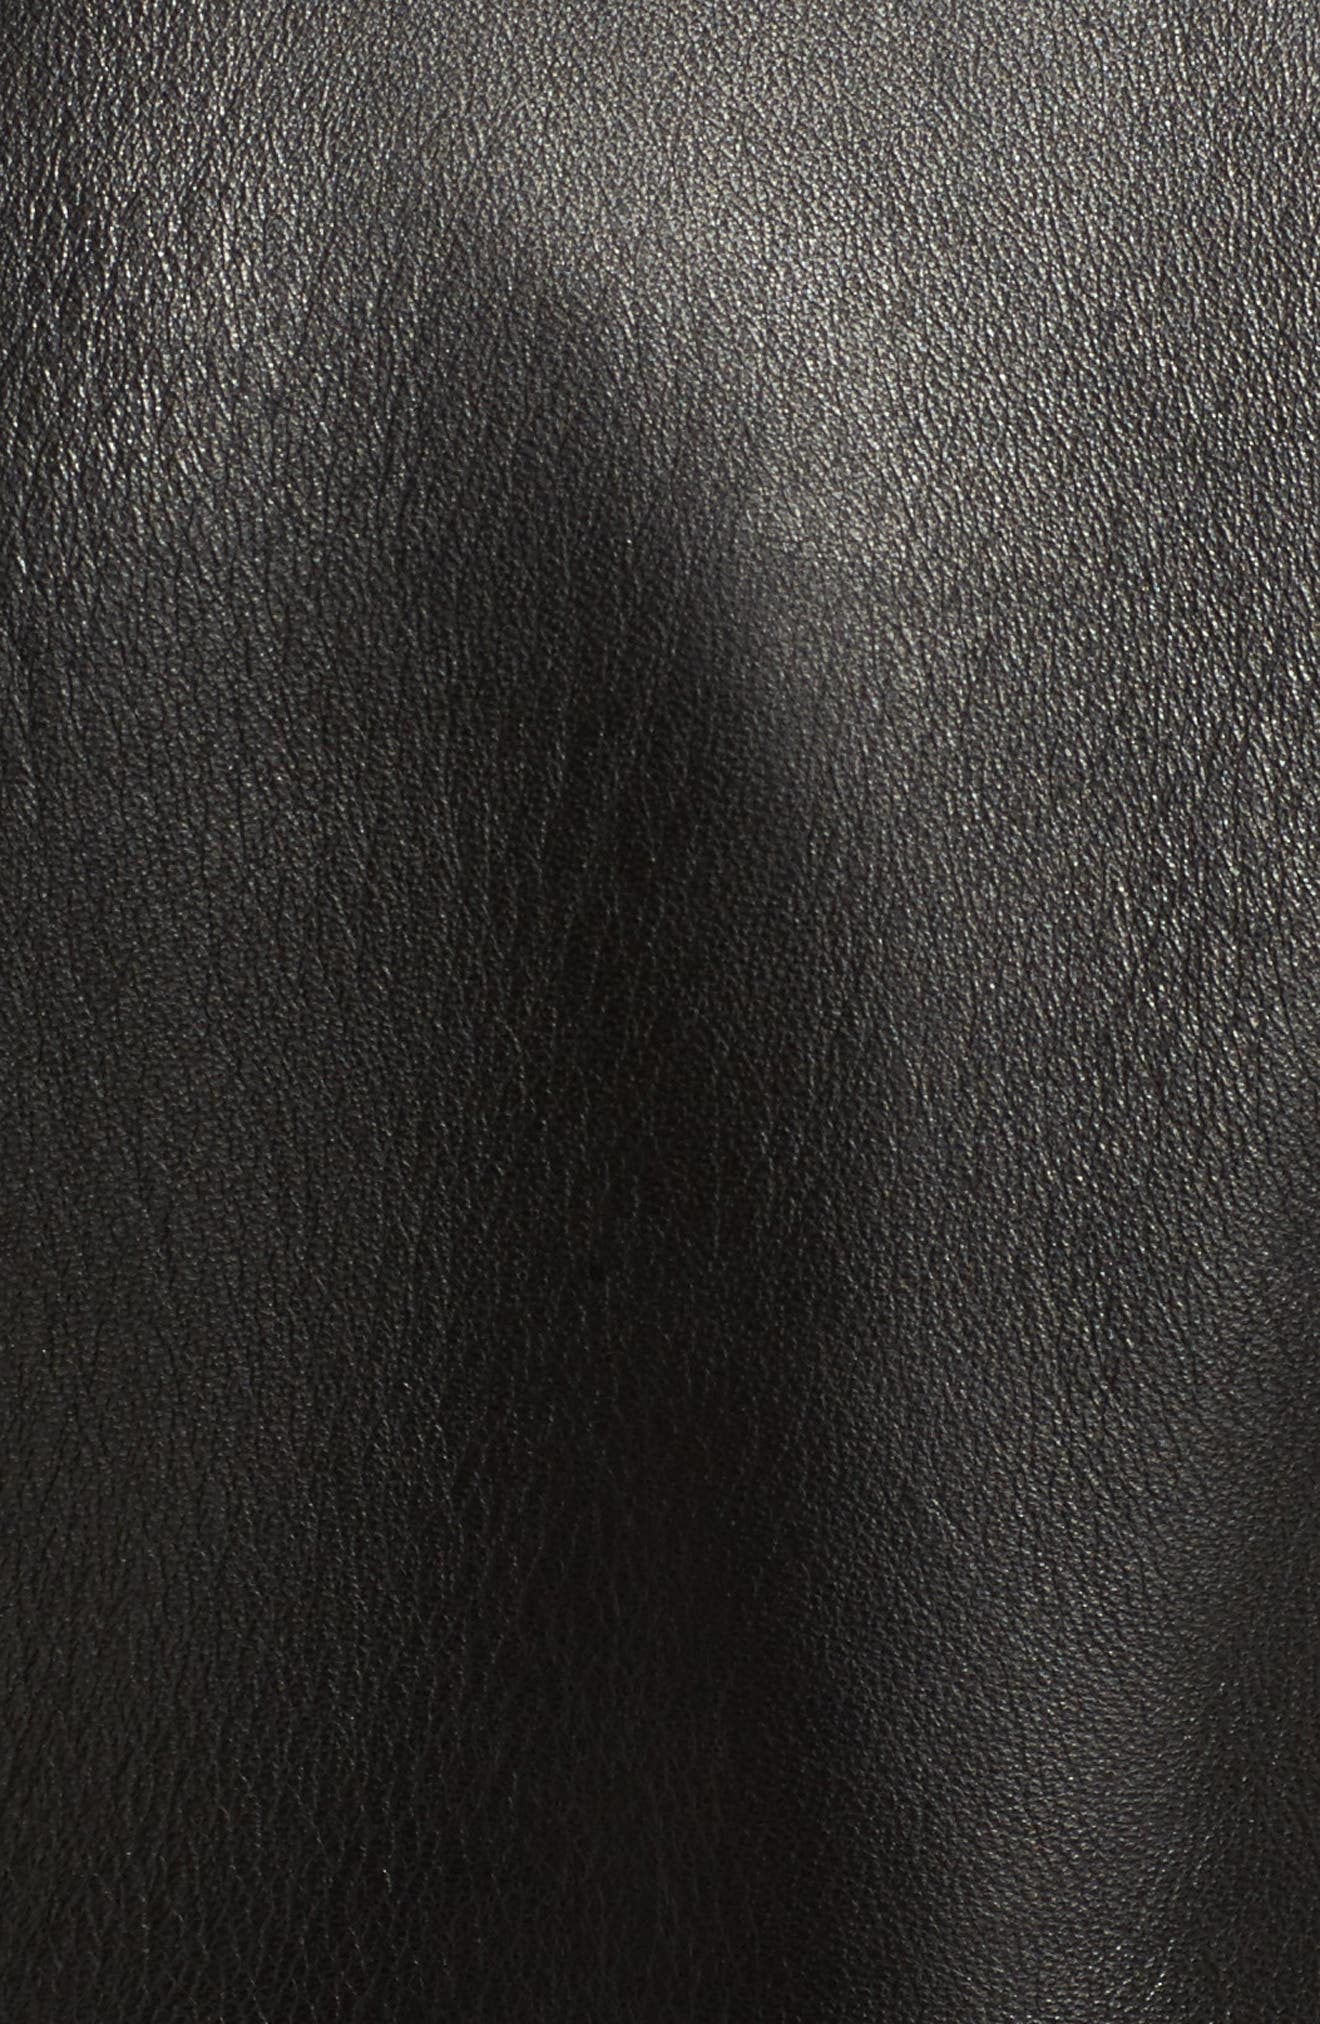 Perfecto Crop Leather Jacket,                             Alternate thumbnail 5, color,                             Black